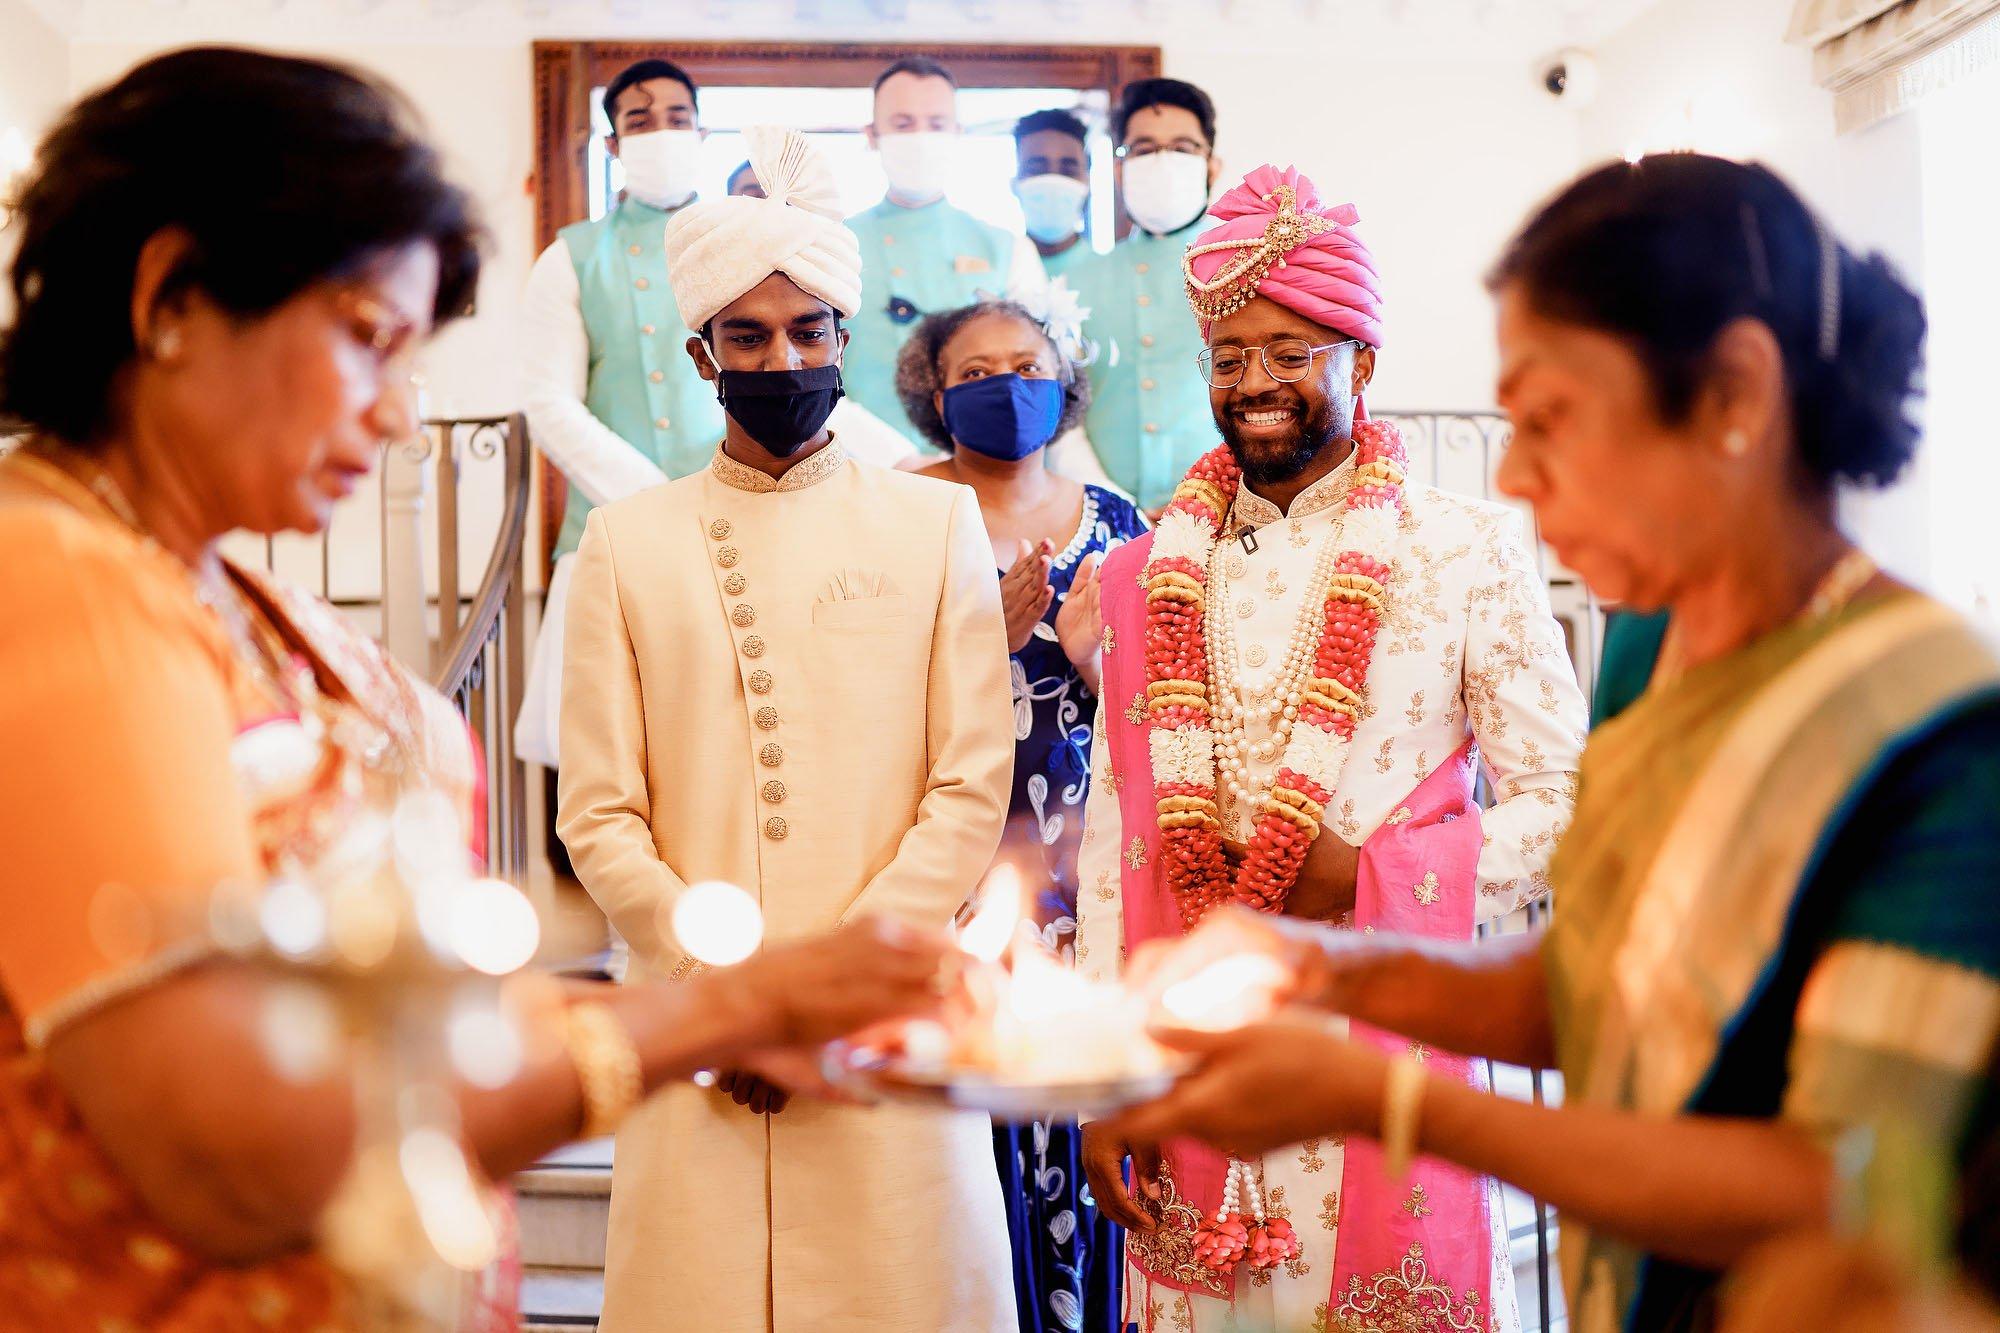 Parklands quendon hall sri lankan hindu wedding photography by arj photography